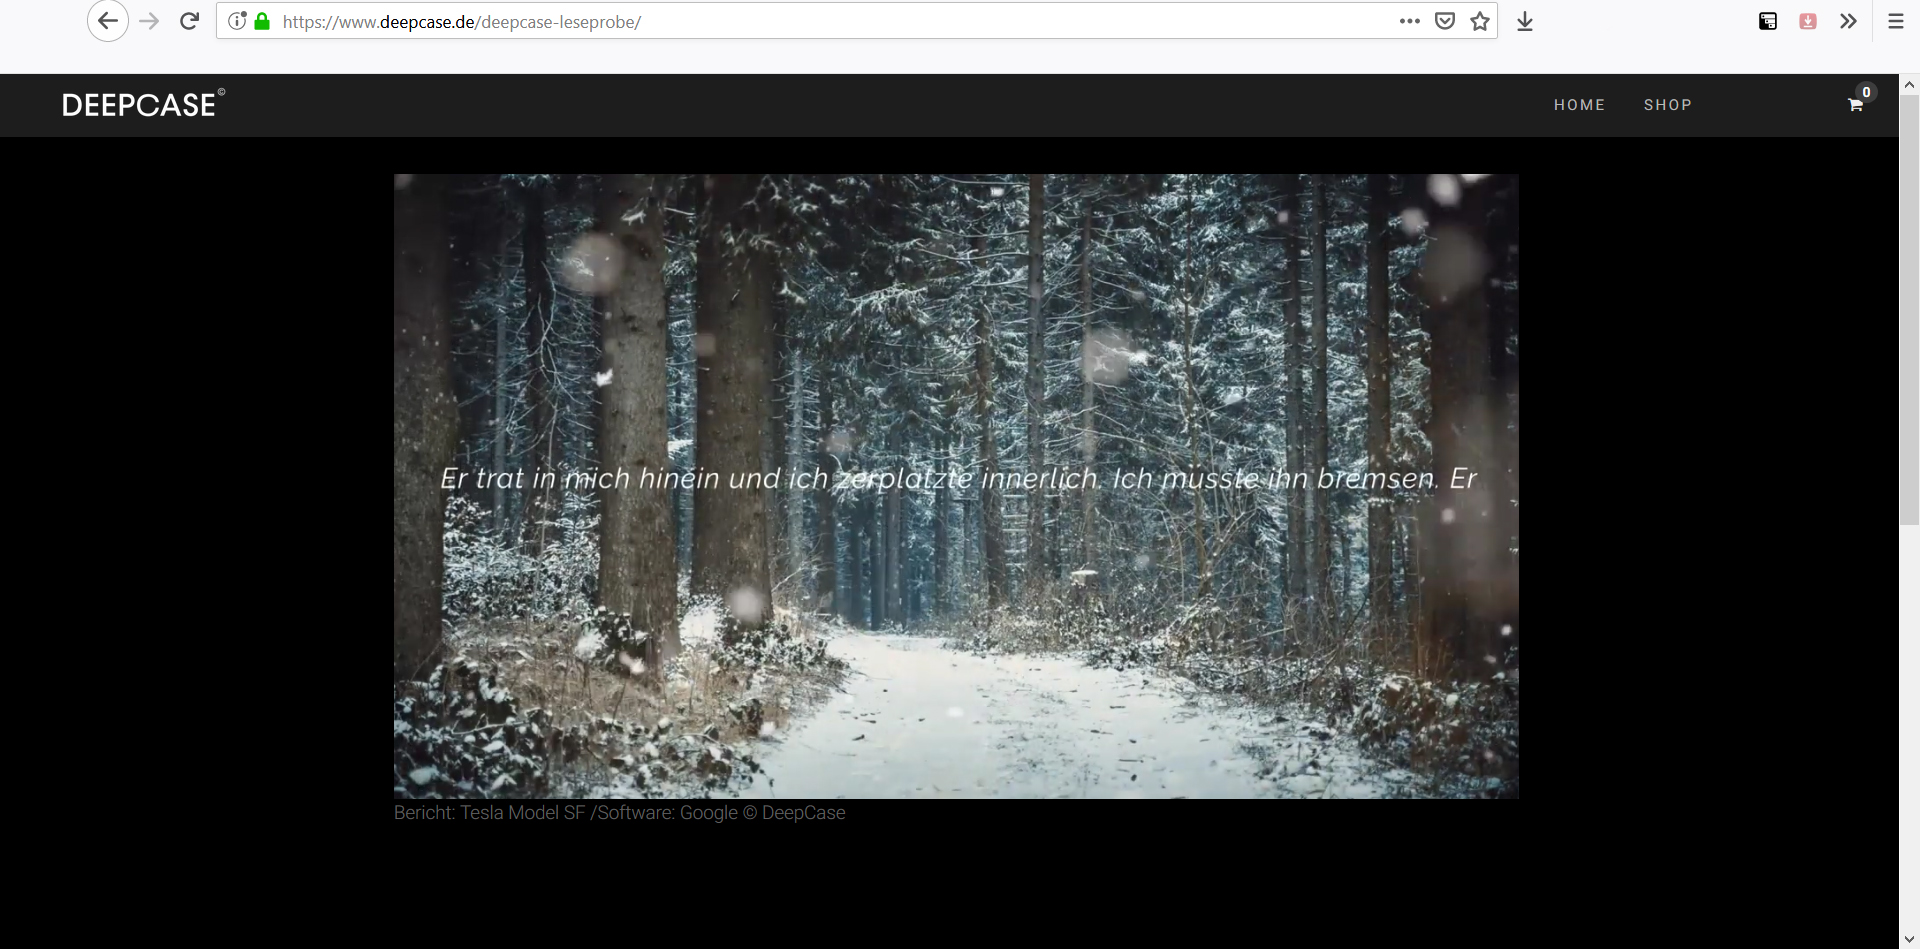 SCREENSHOT_Deepcase_website_Leseprobe